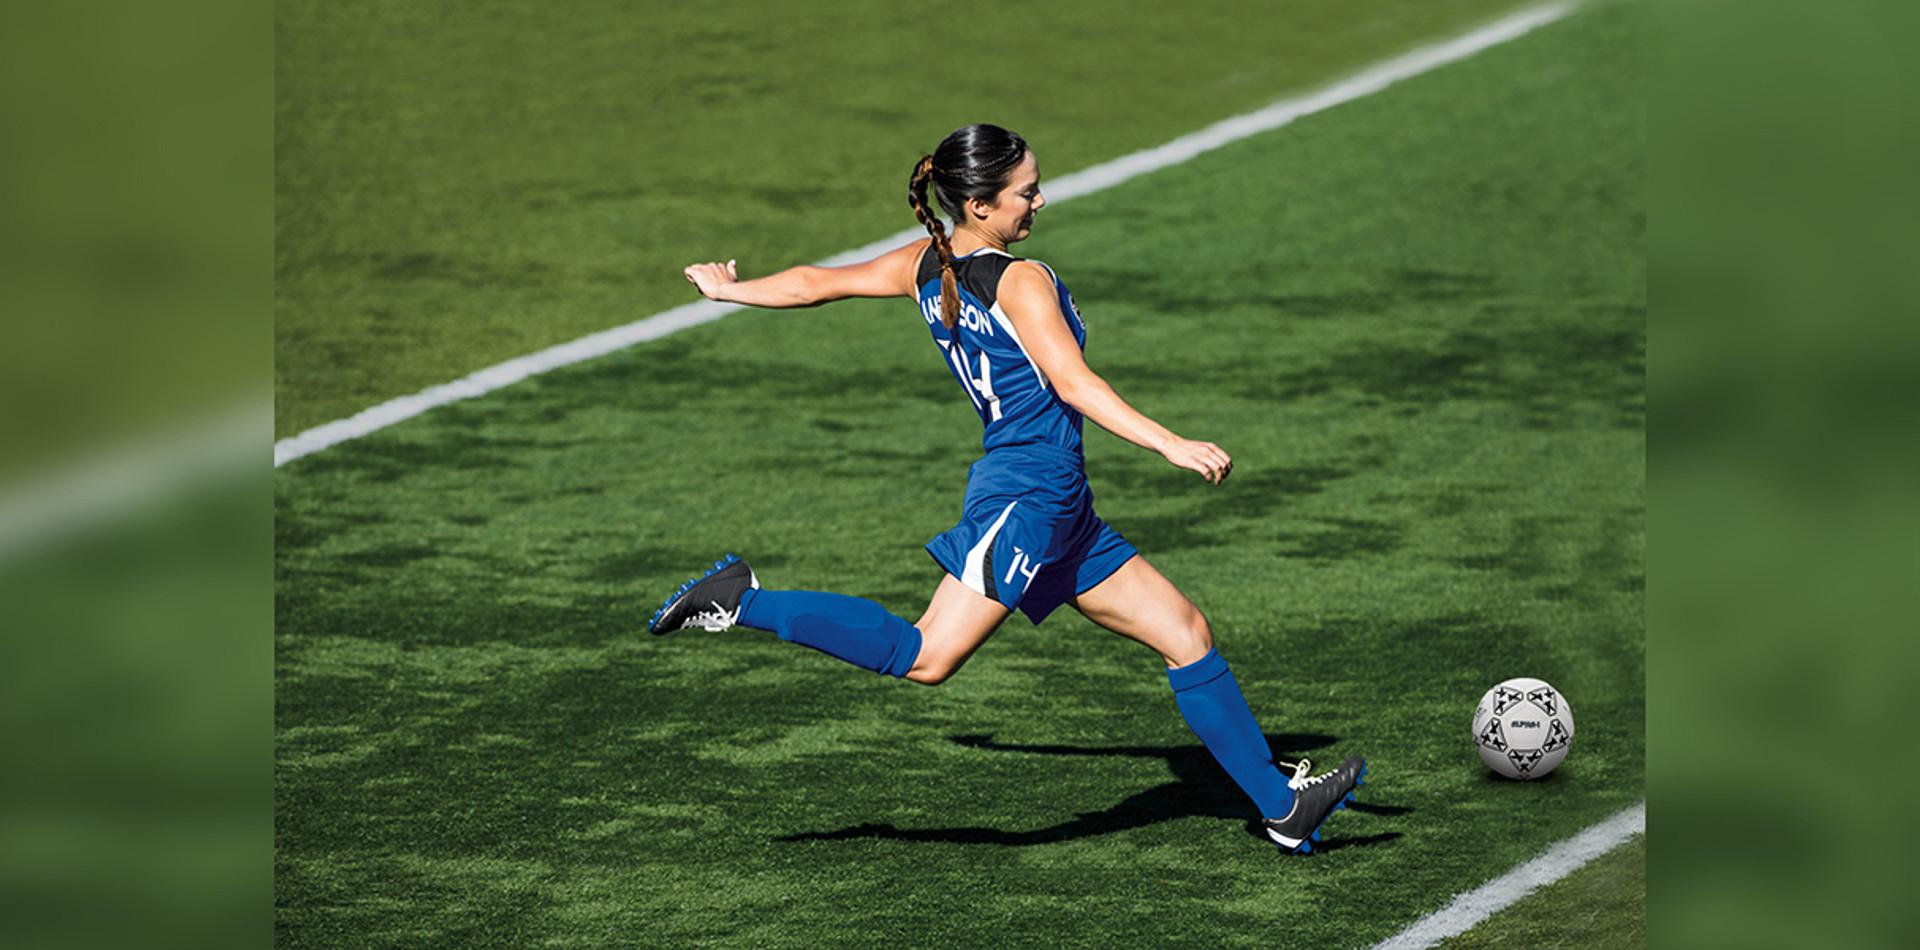 Girl kicking soccer ball on field